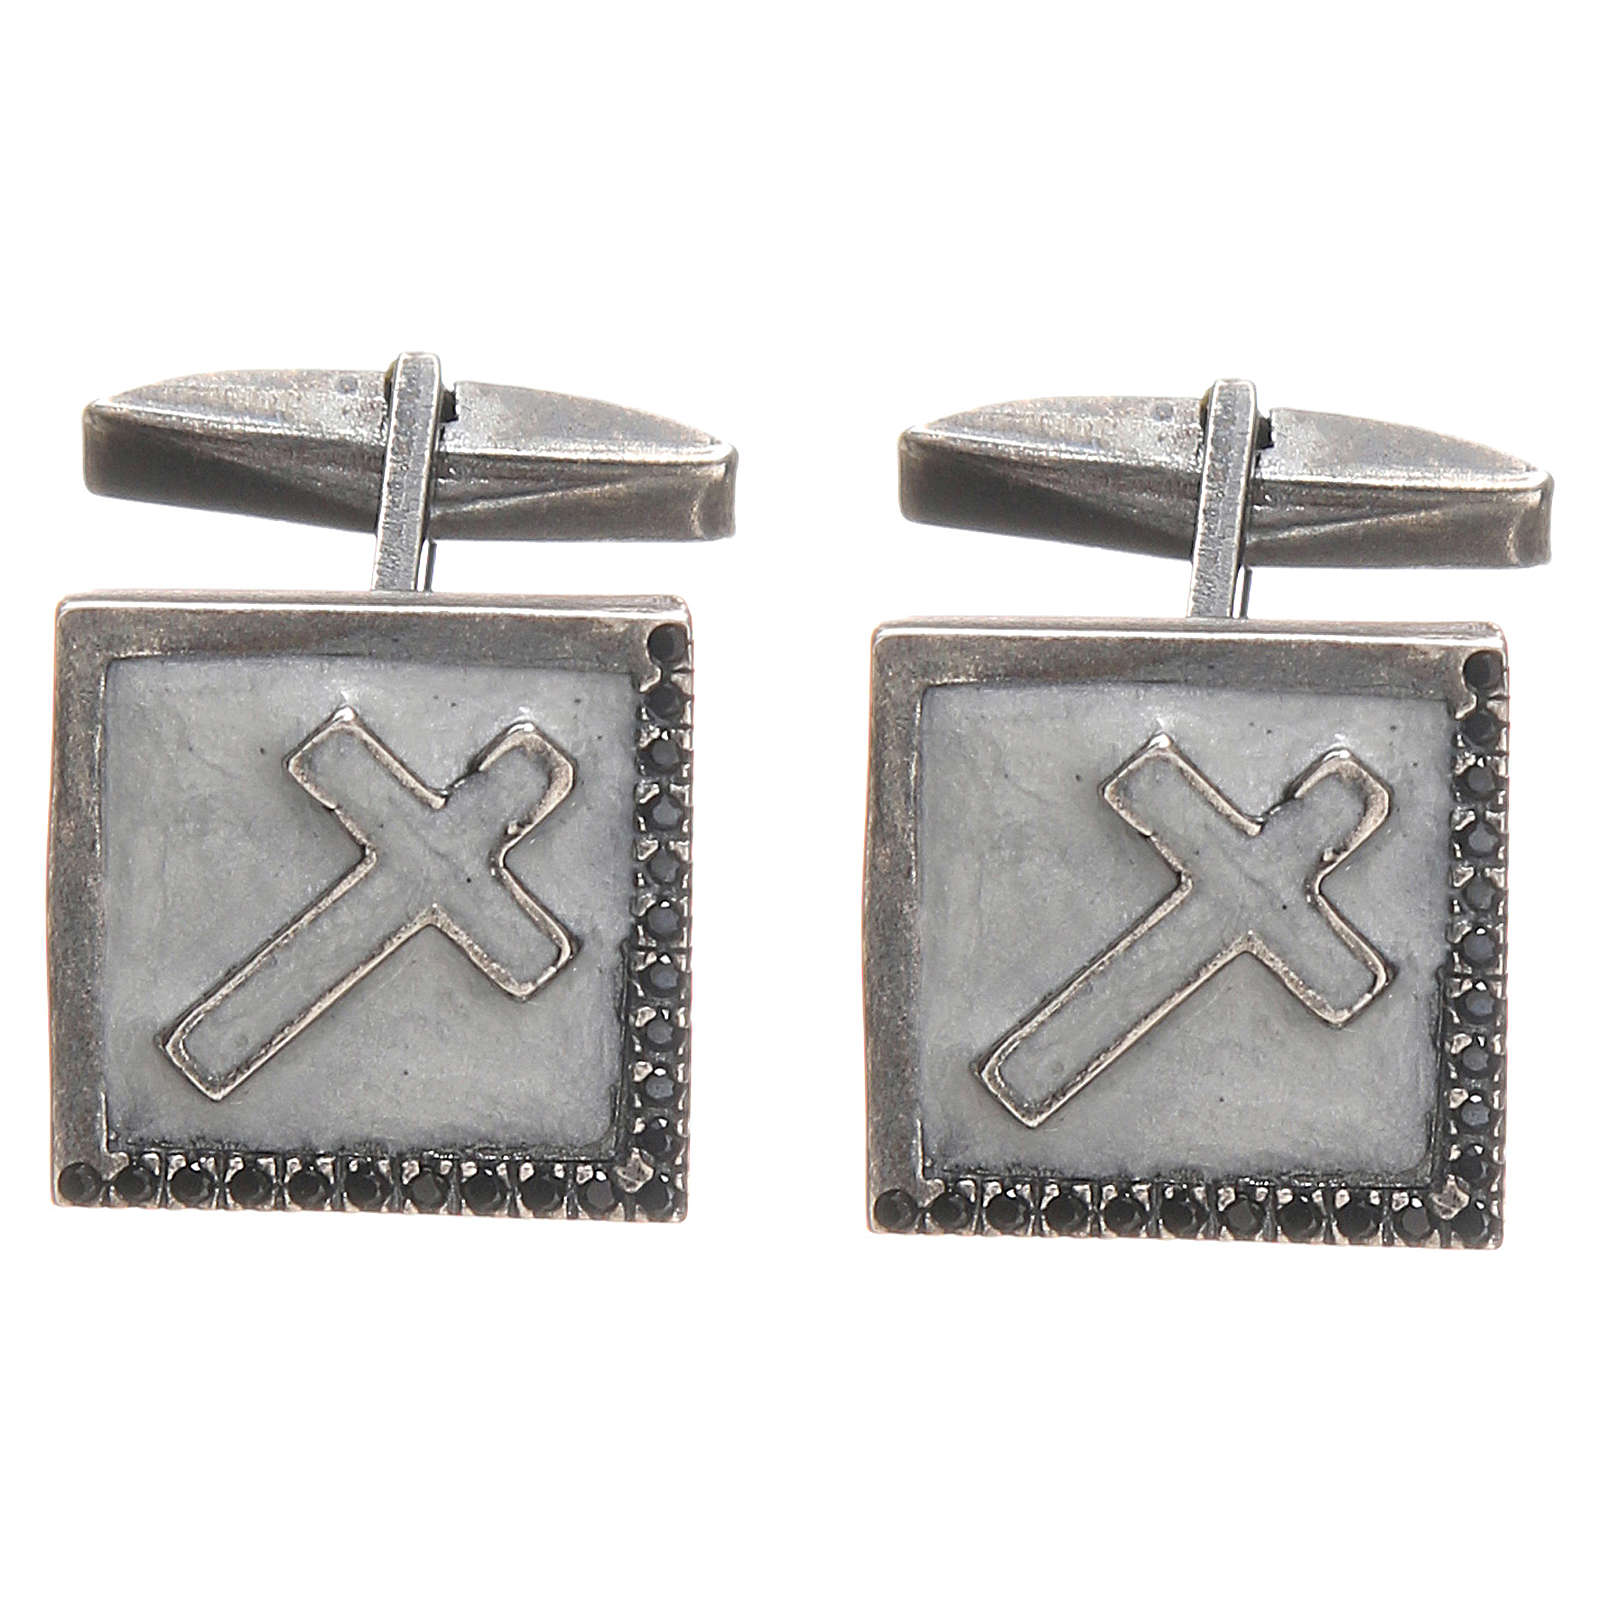 Spinki biżuteria srebro 925 Krzyż 1.6x1.6 cm 4